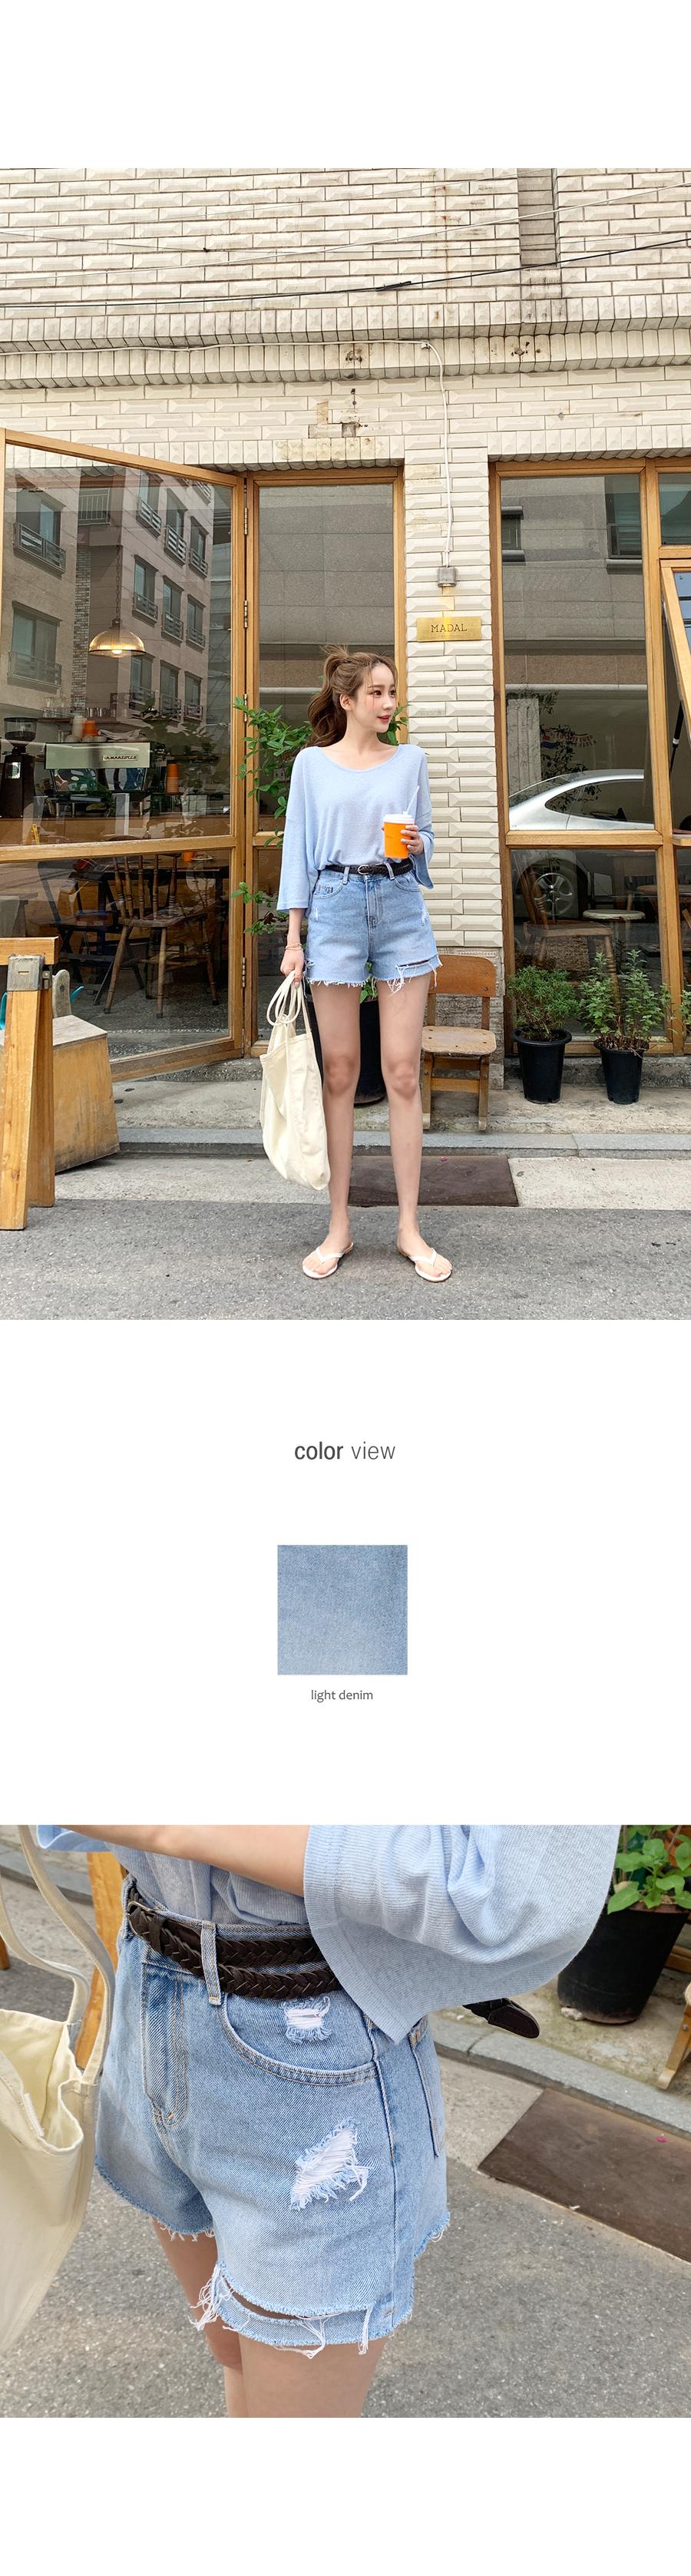 Washim denim shorts